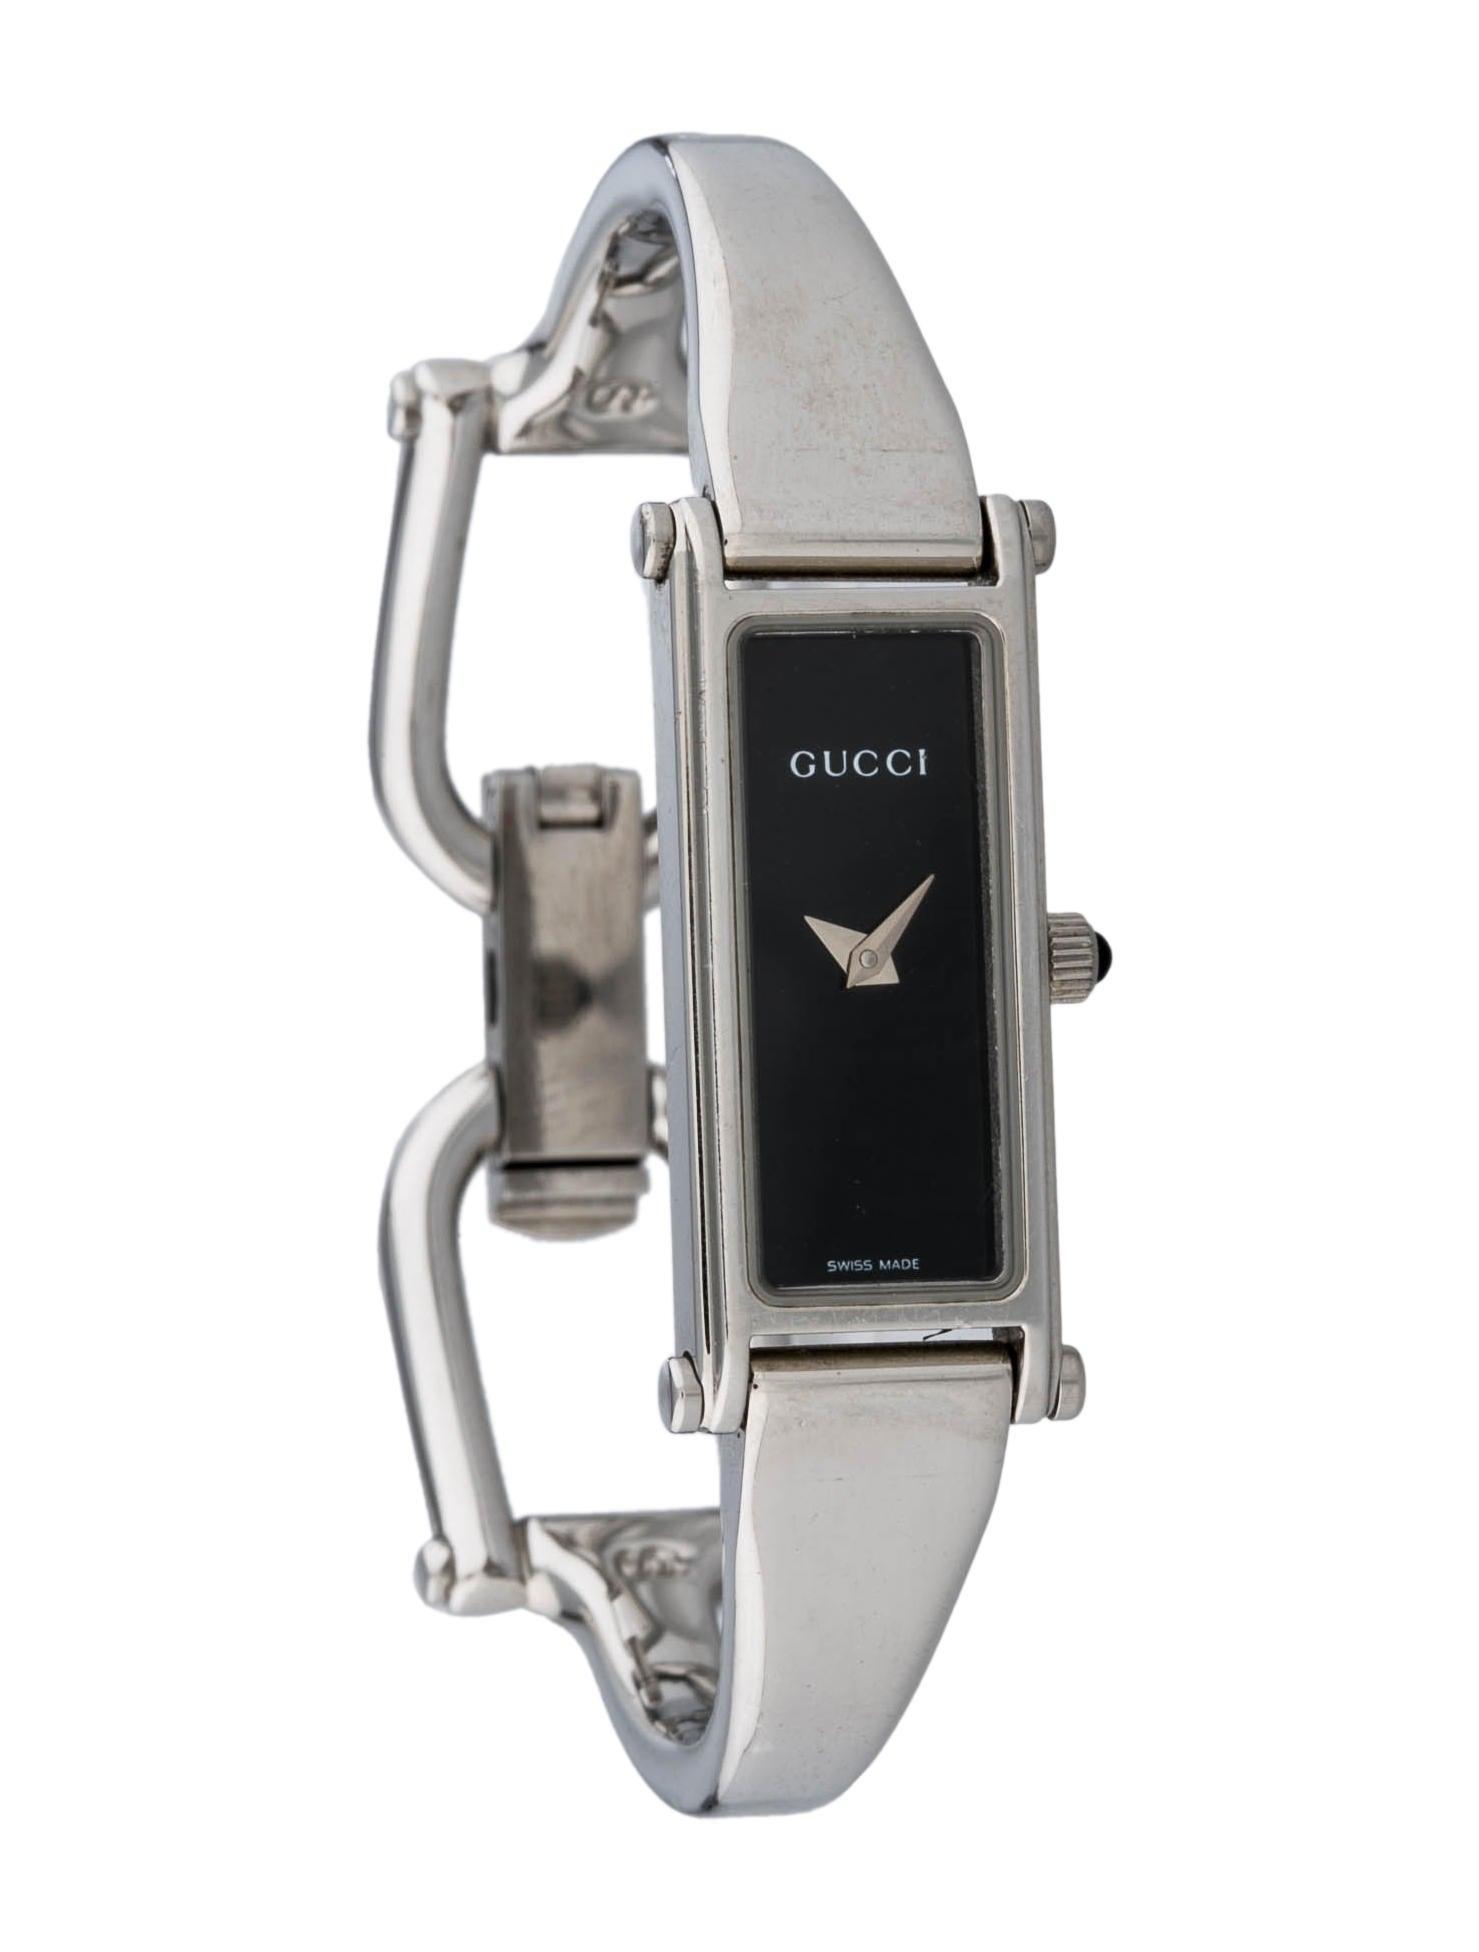 320168fc5f3 Gucci 1500L Watch - Bracelet - GUC38705